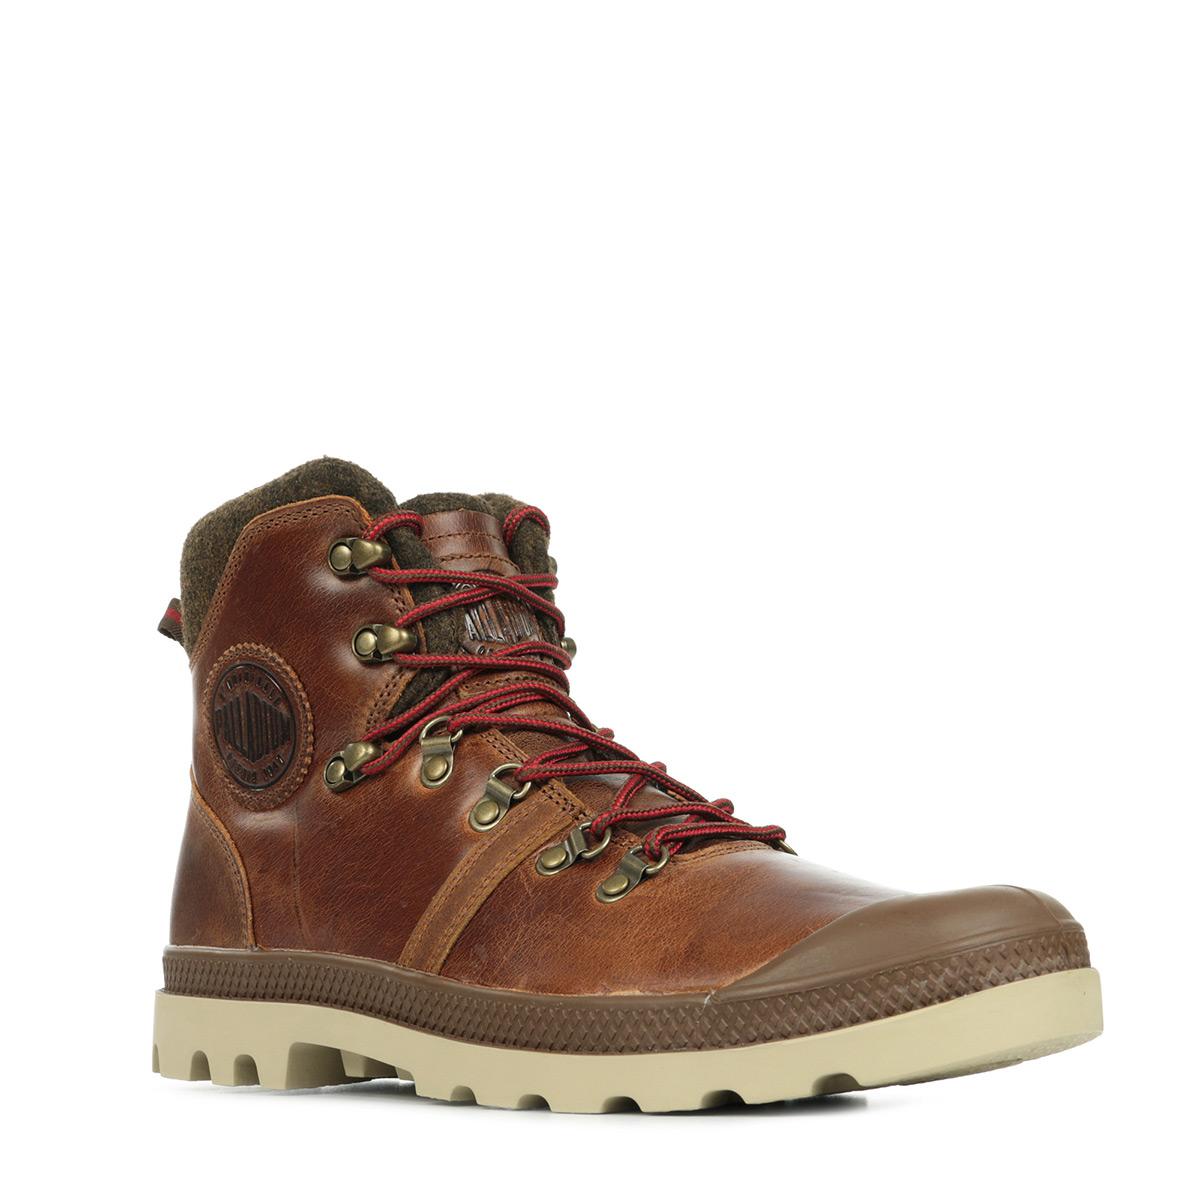 Palladium Pallab Hiker Sunrise Red Saf H 74421E20, Boots homme